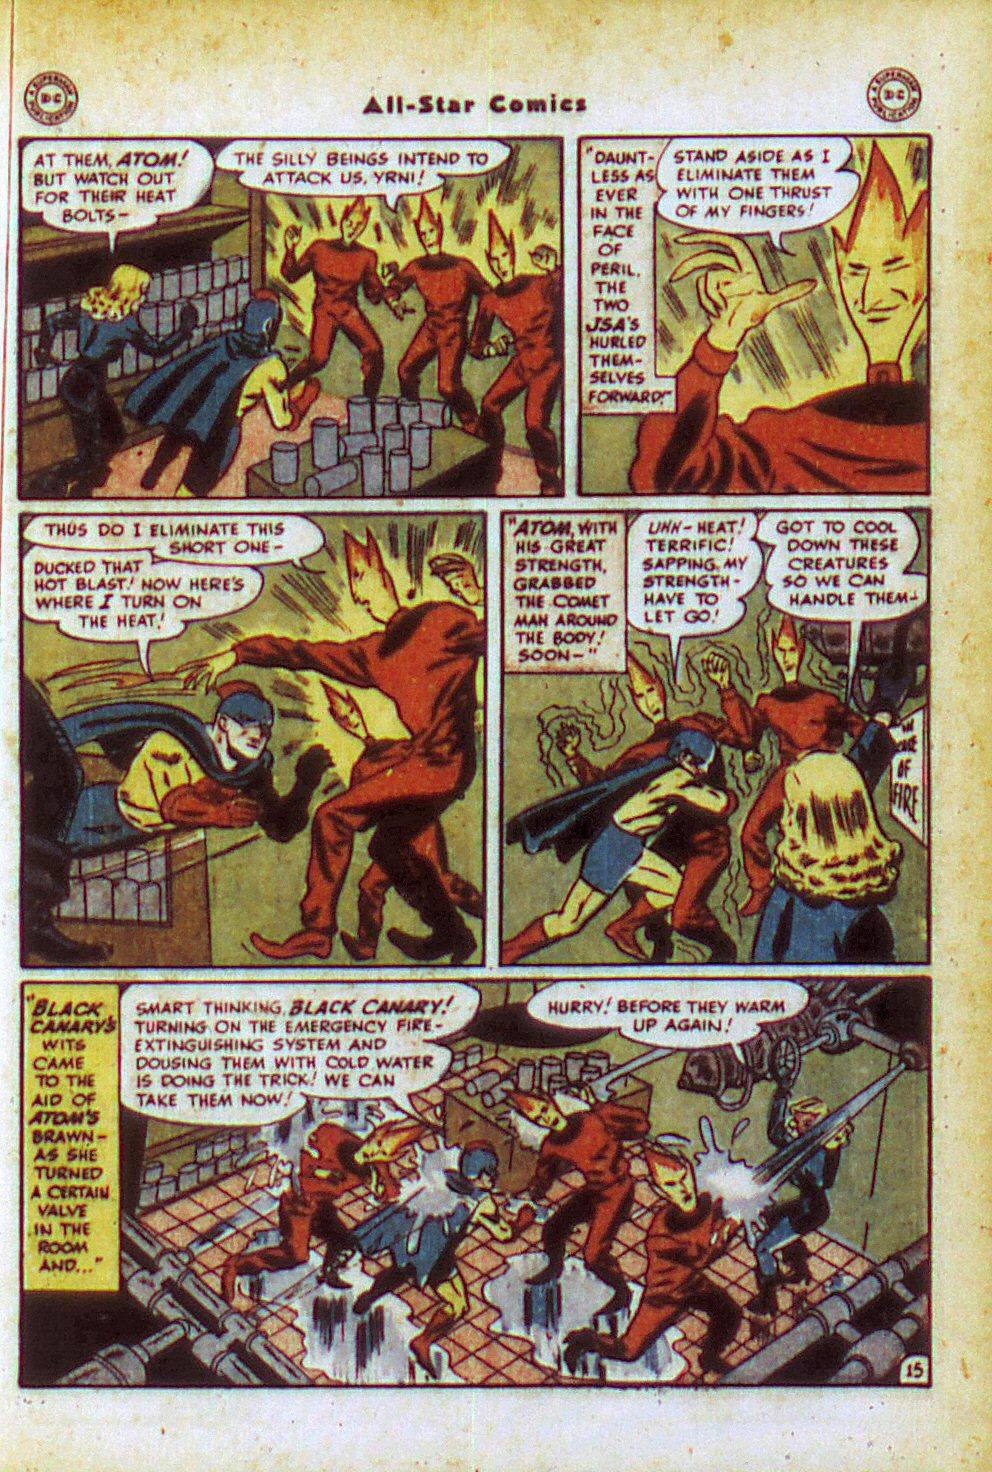 Read online All-Star Comics comic -  Issue #49 - 19